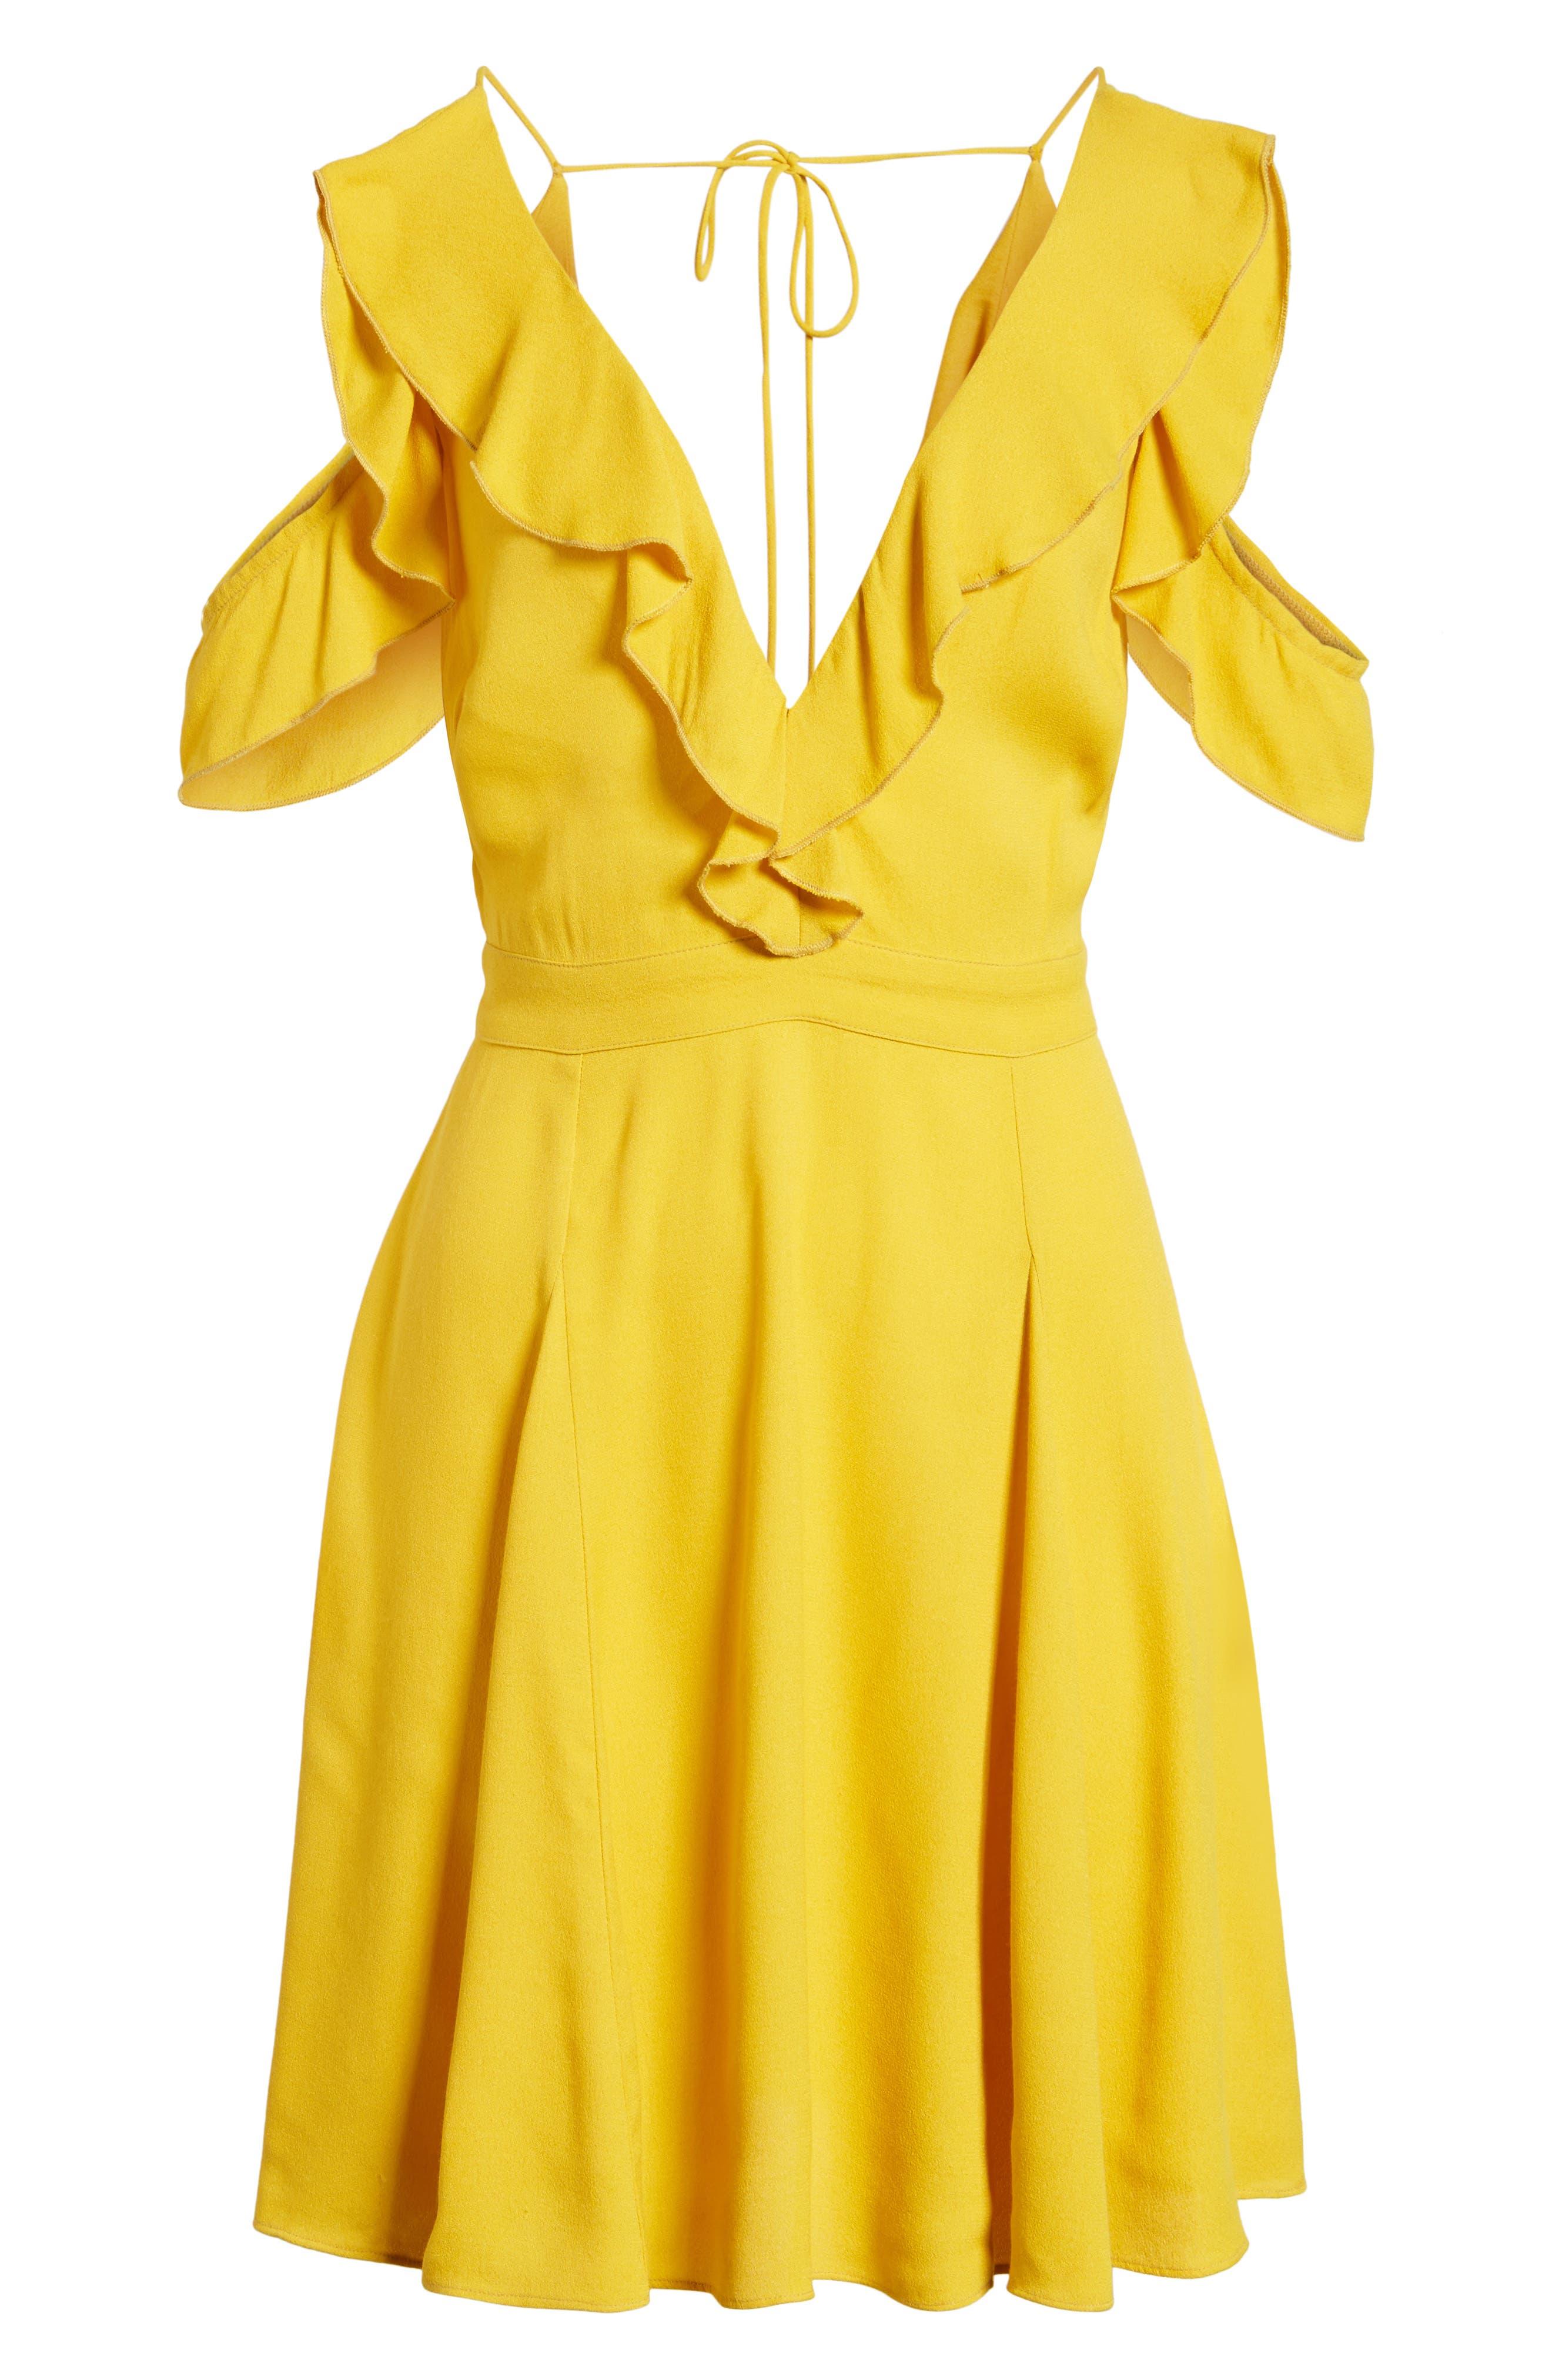 Enzo Cold Shoulder Fit & Flare Dress,                             Alternate thumbnail 6, color,                             Sun